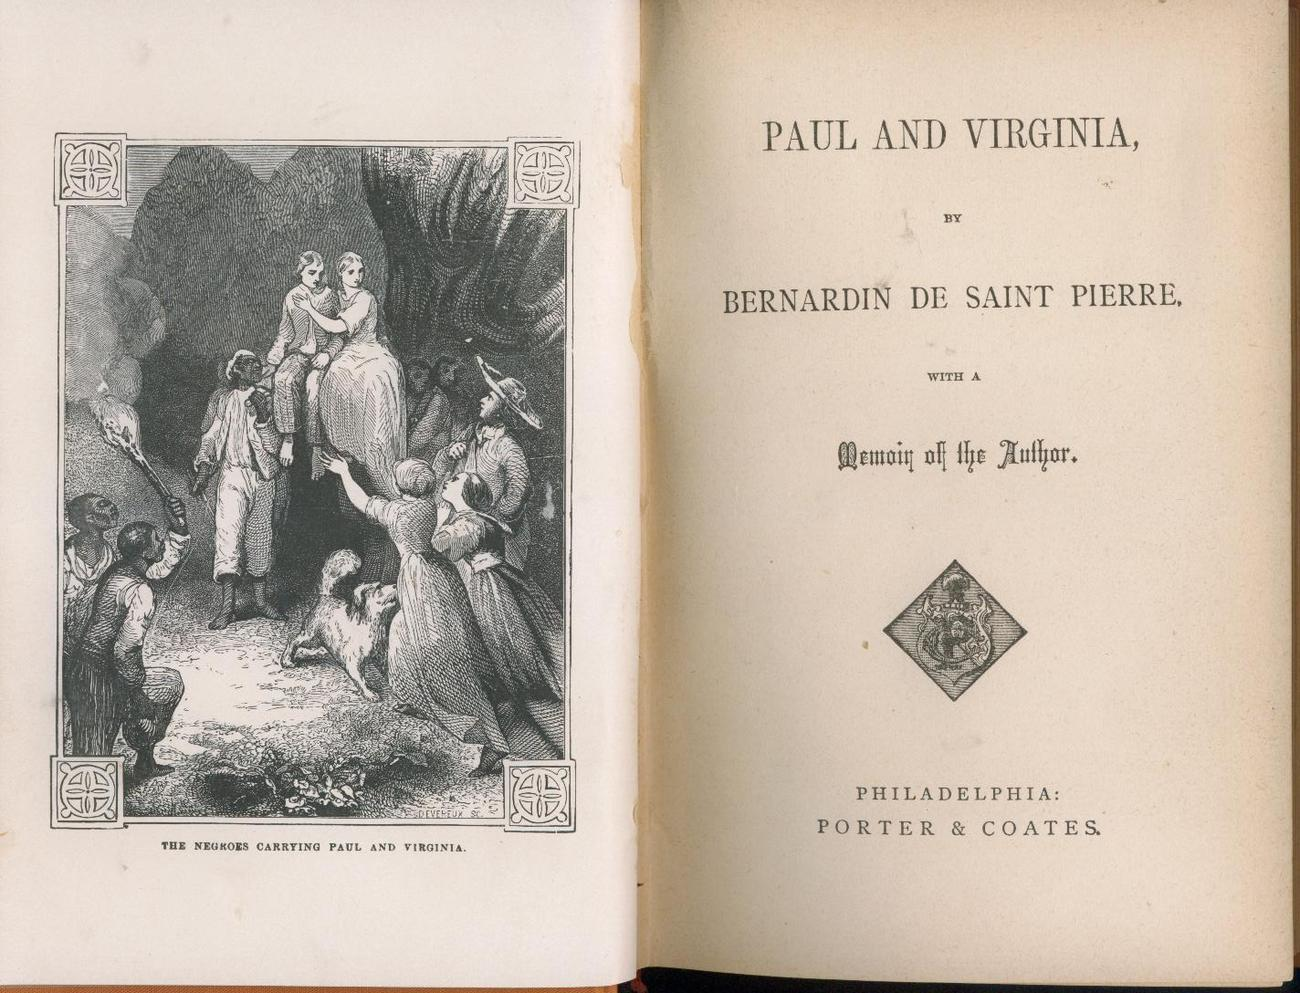 De Saint Pierre--PAUL AND VIRGINIA--1891-VERY NICE CONDITION